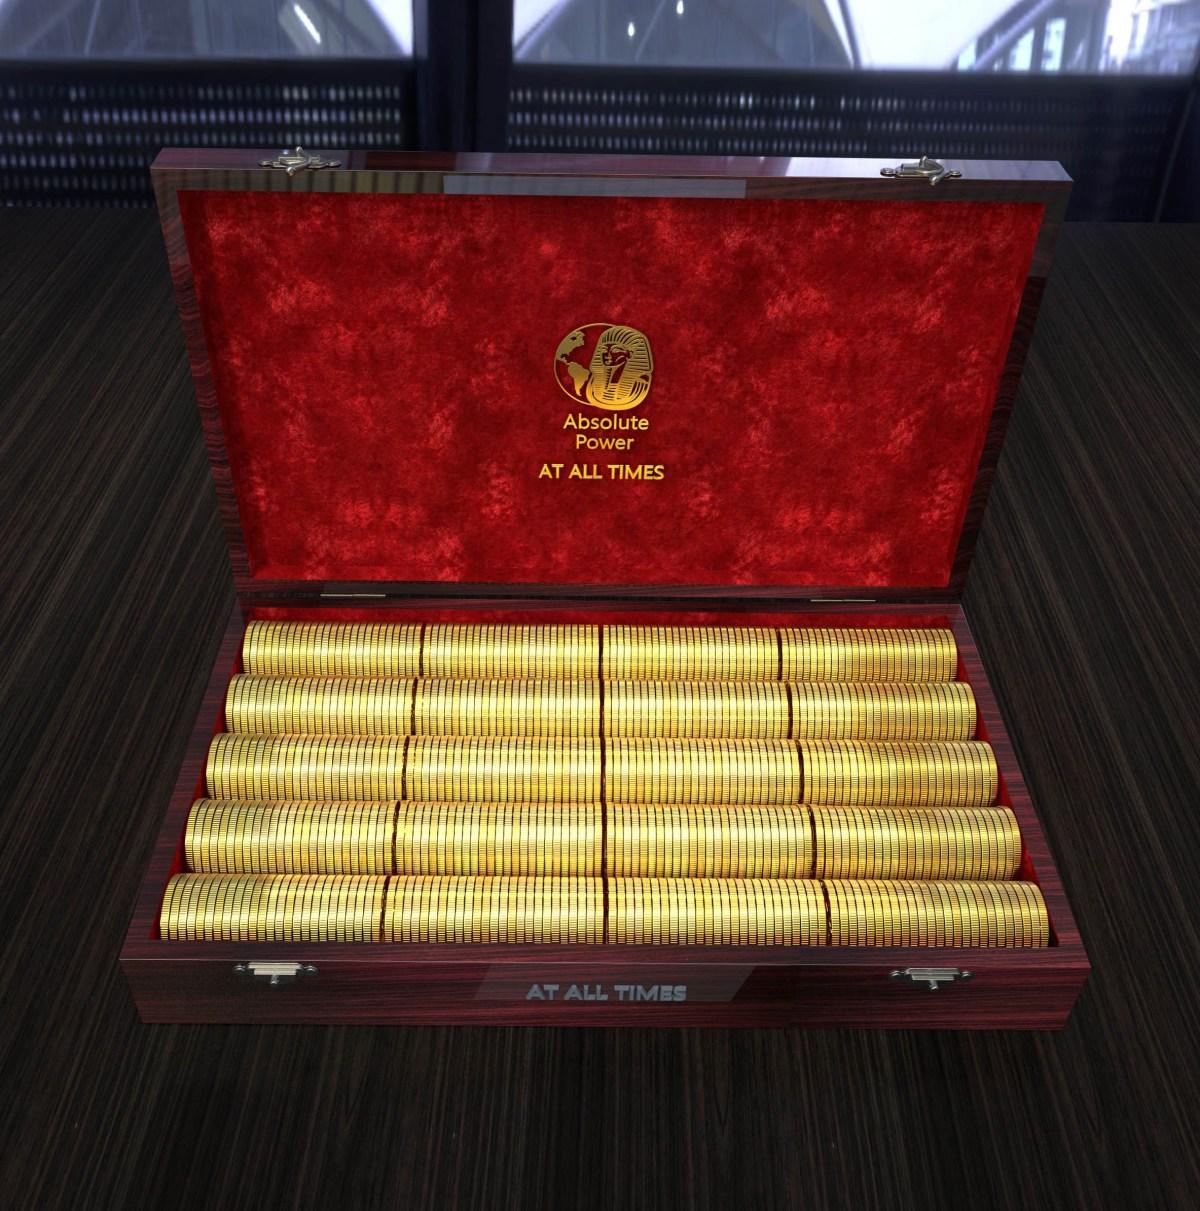 шкатулка с золотыми монетами